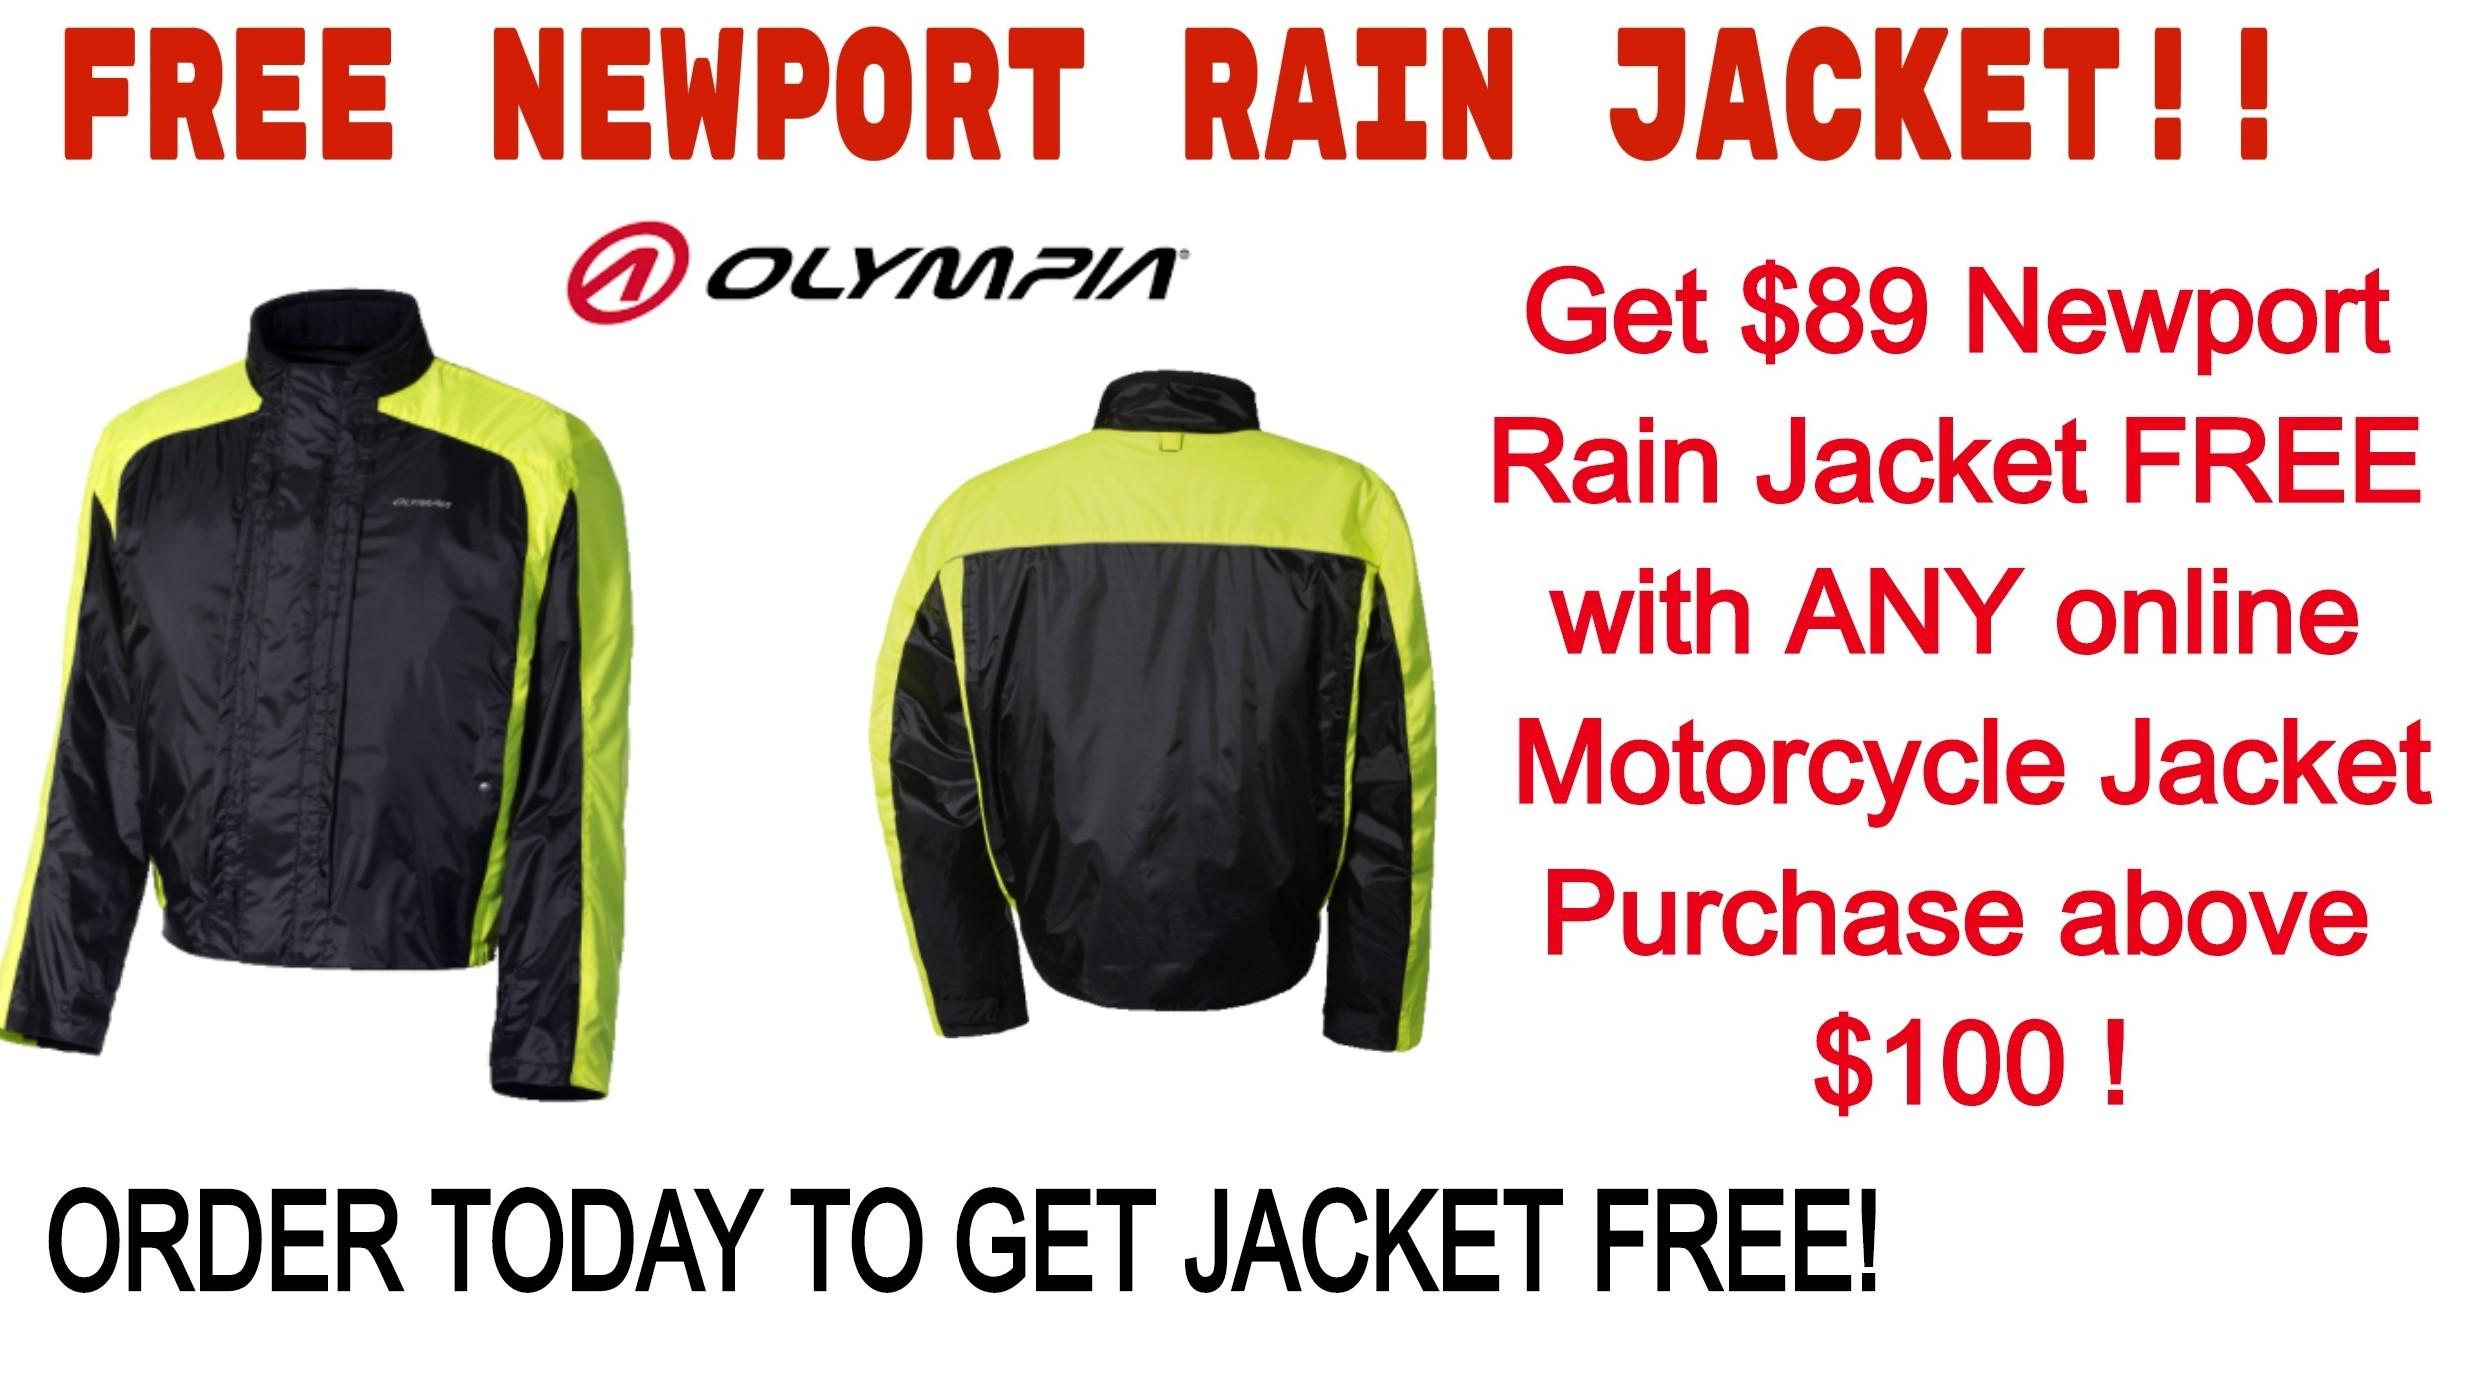 Free Newport Rain Jacket